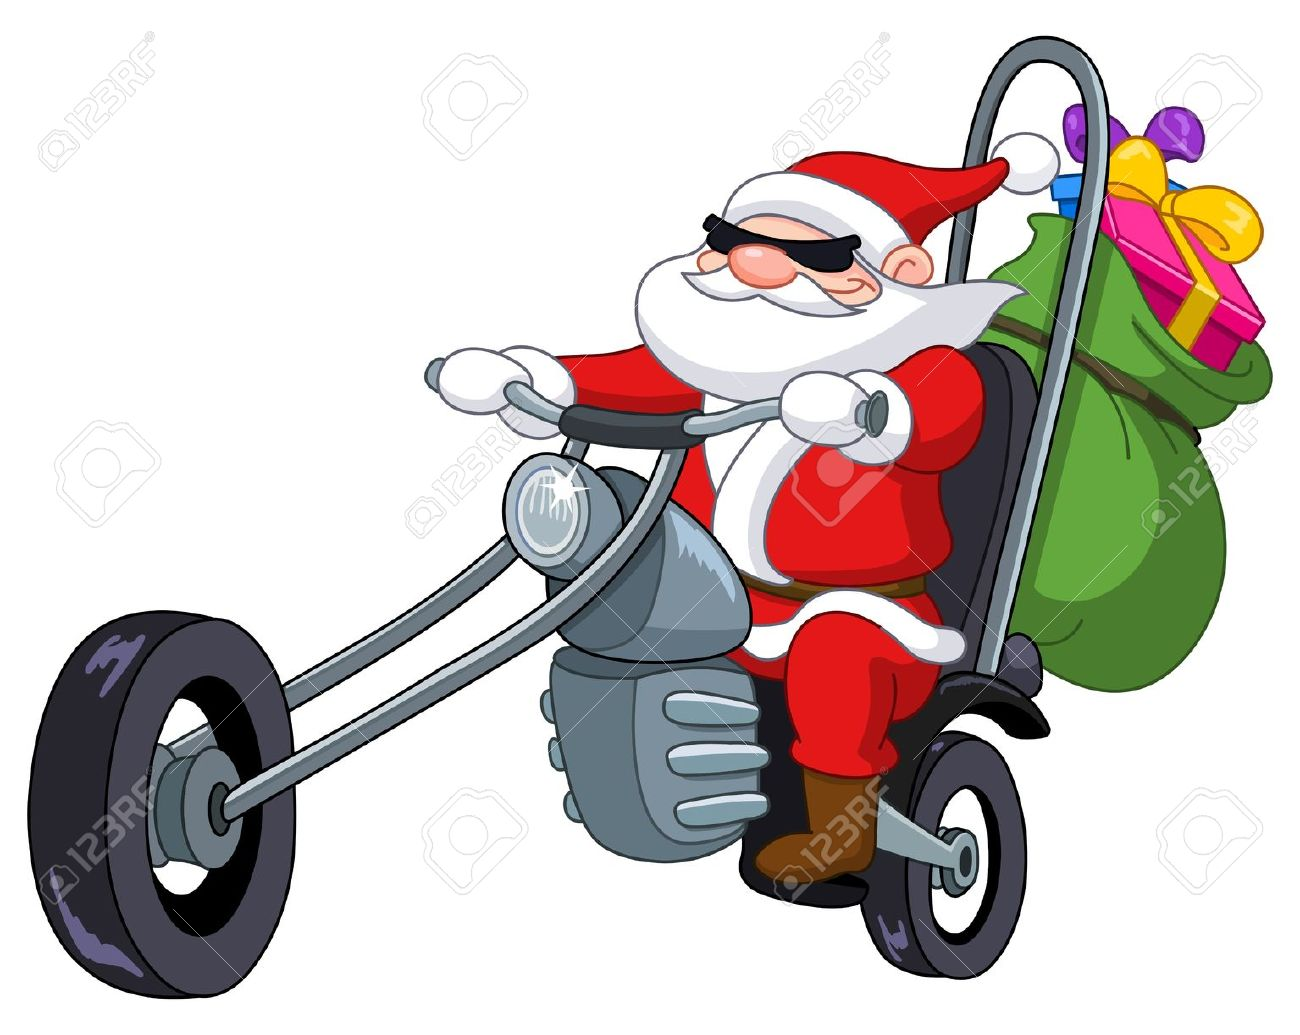 Santa On A Motorcycle Royalty Free Cliparts, Vectors, And Stock.